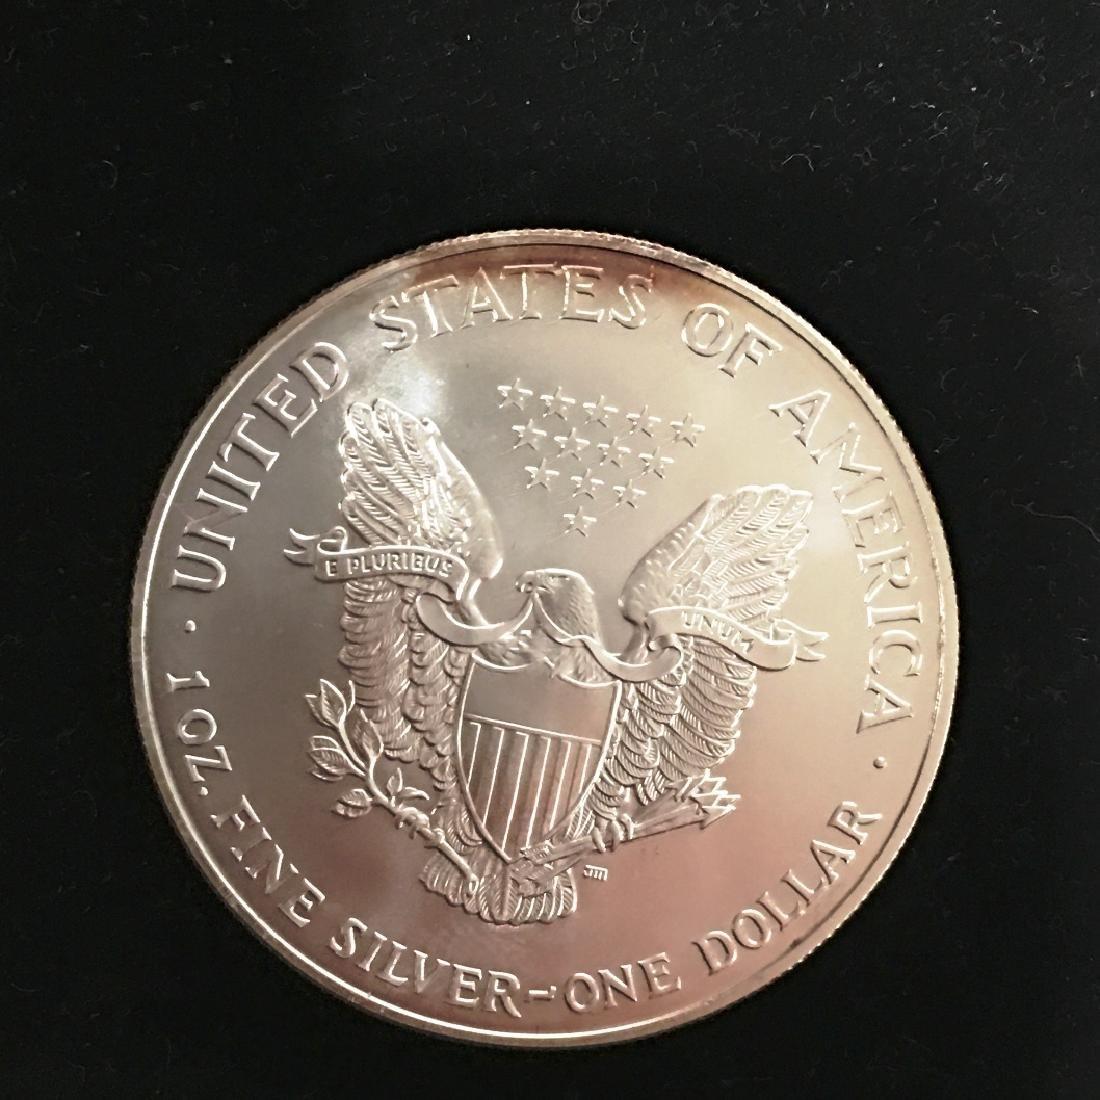 2001 SILVER EAGLE $1 - 2